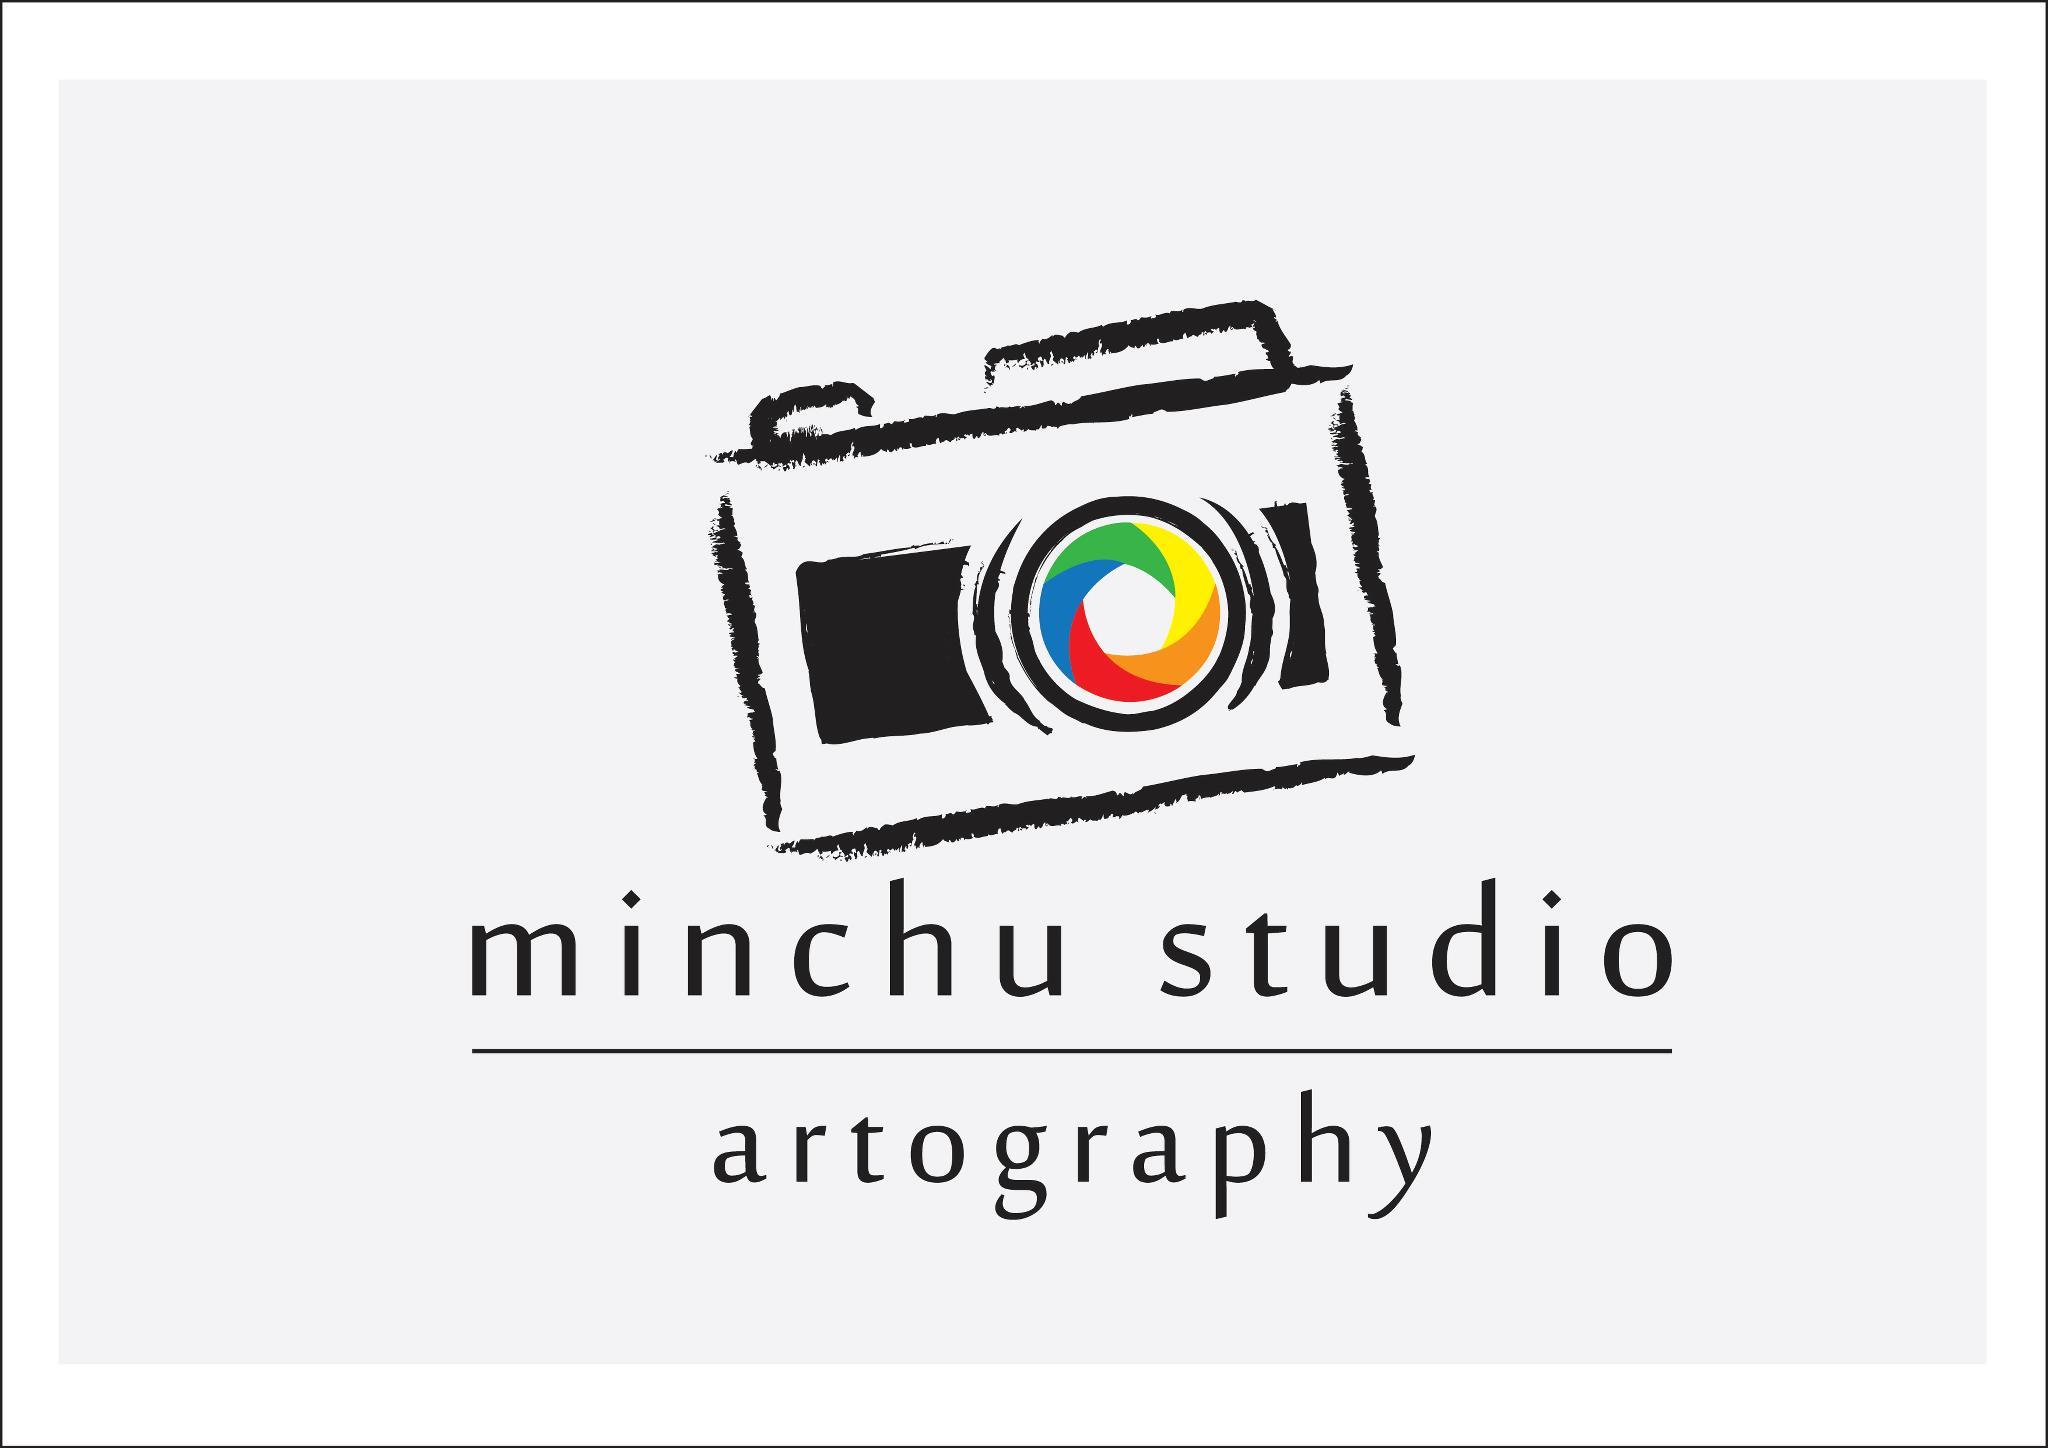 Minchu Studio